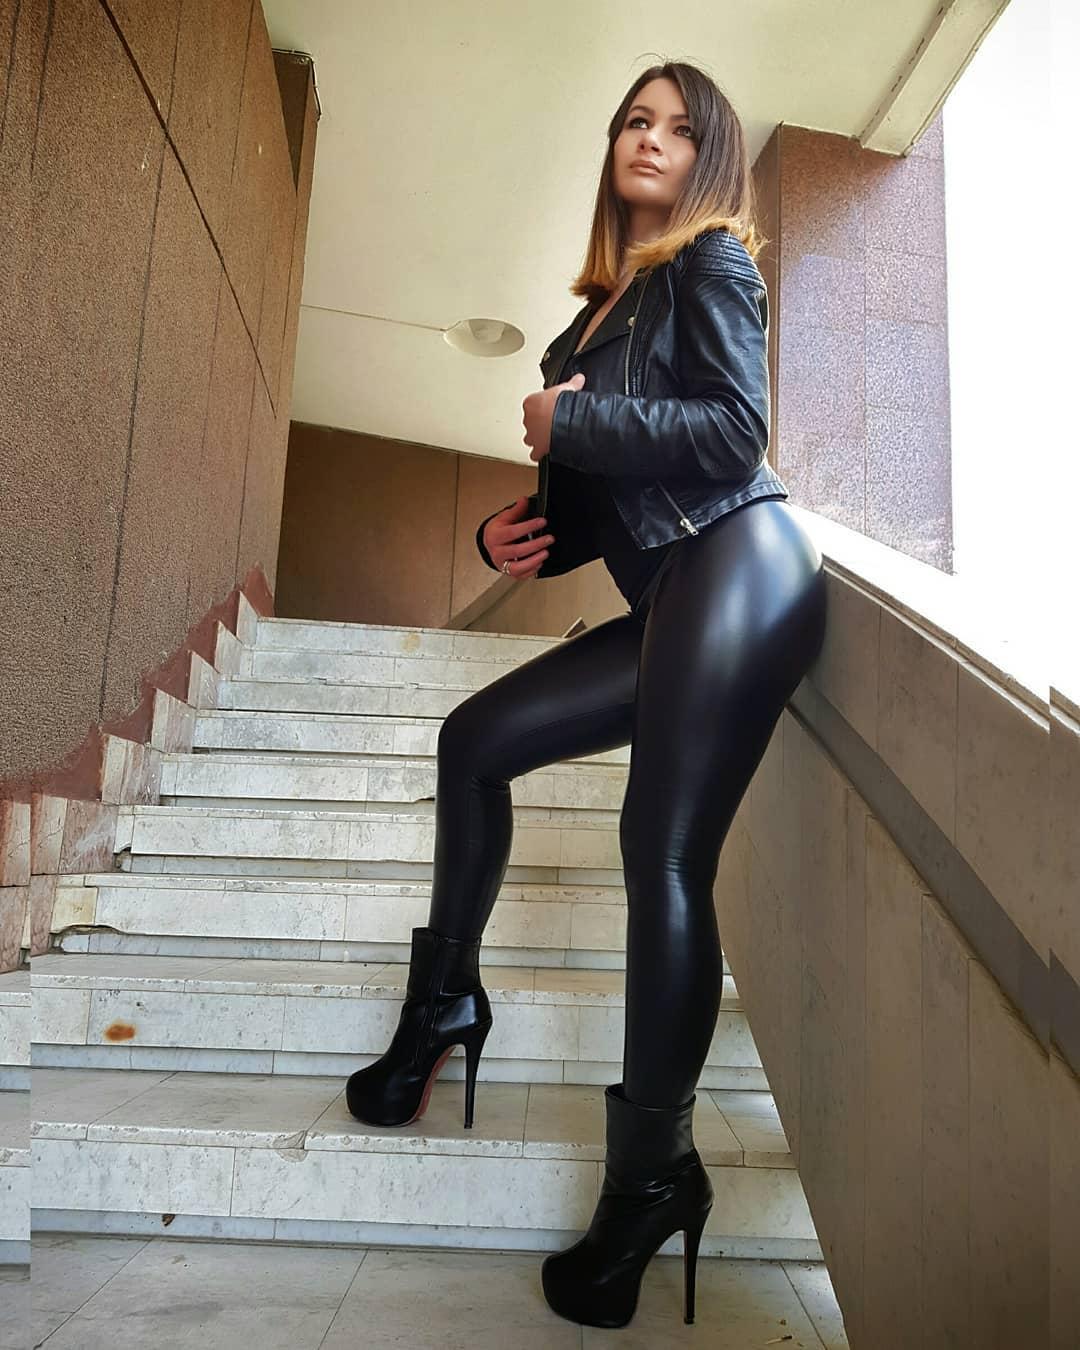 Olga-Madych-Wallpapers-Insta-Fit-Bio-11